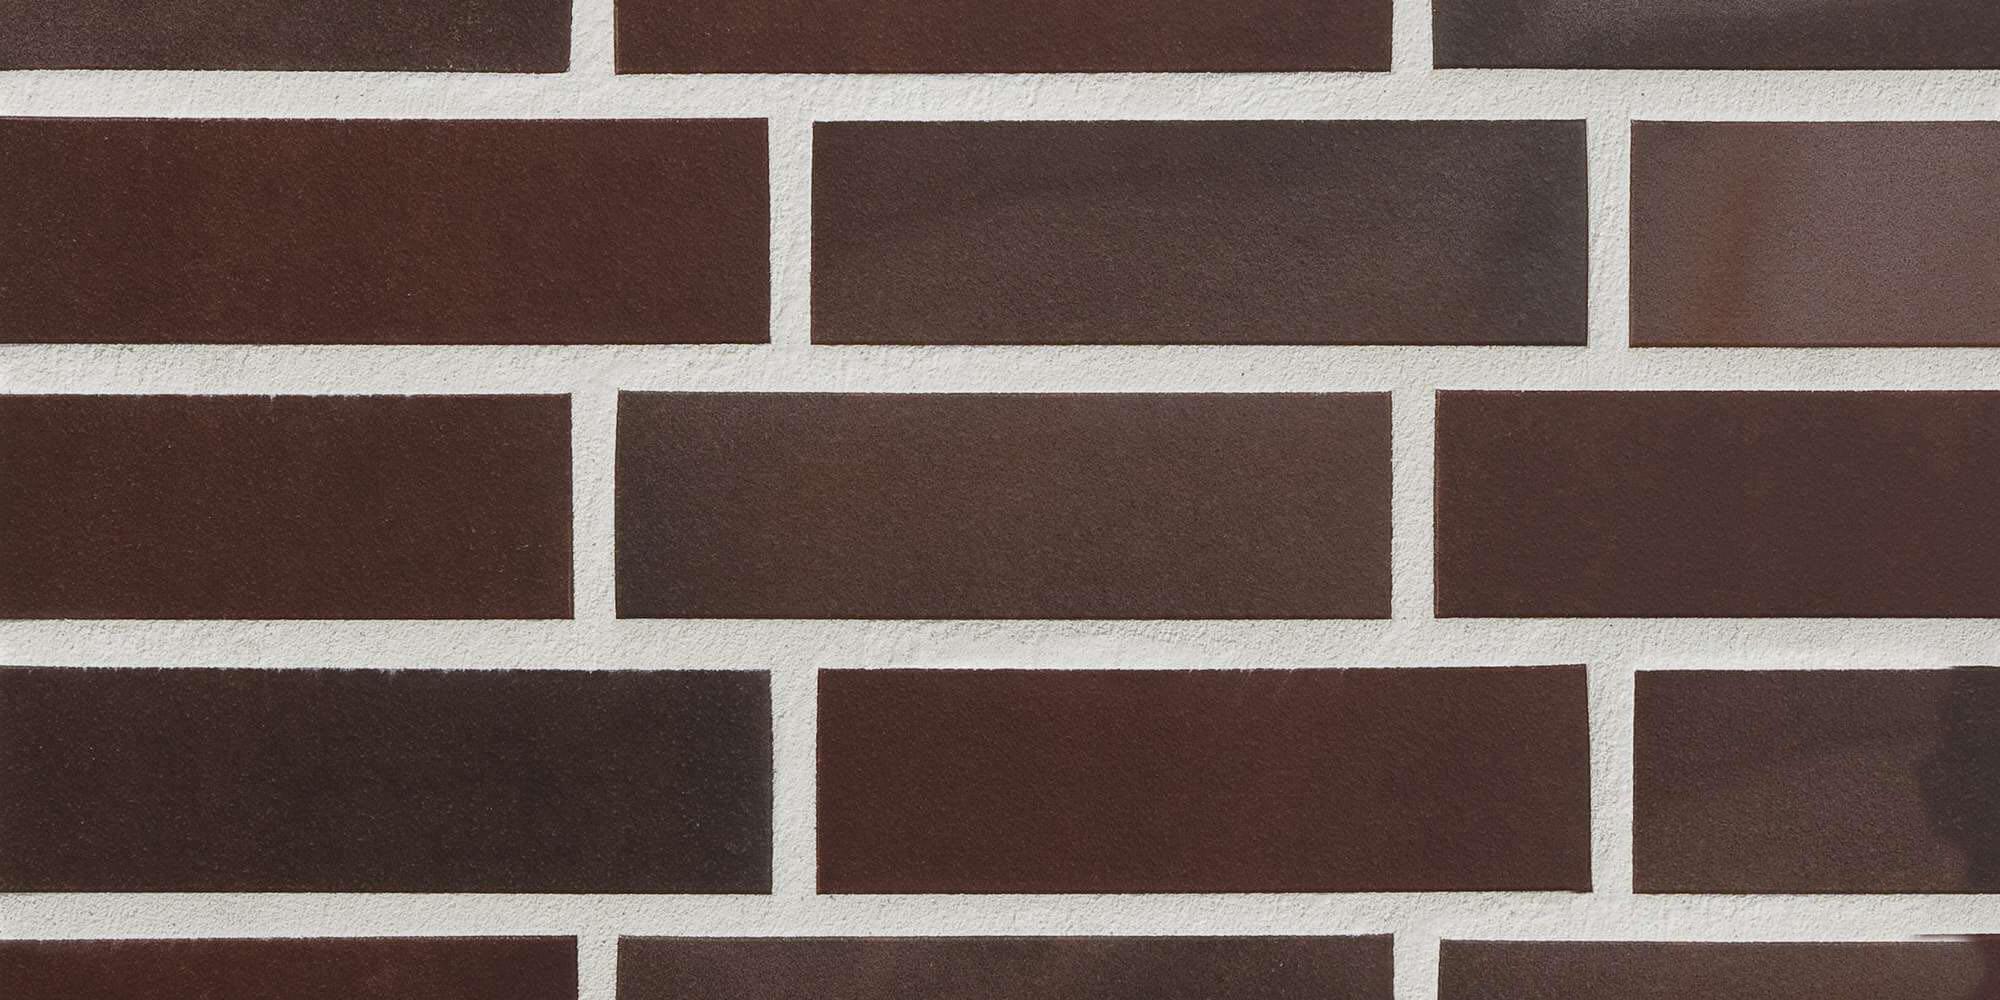 Stroeher, плитка-клинкер под кирпич, цвет 825 sherry, серия Keravette shine, glasiert, глазурованная, гладкая, 240x52x8